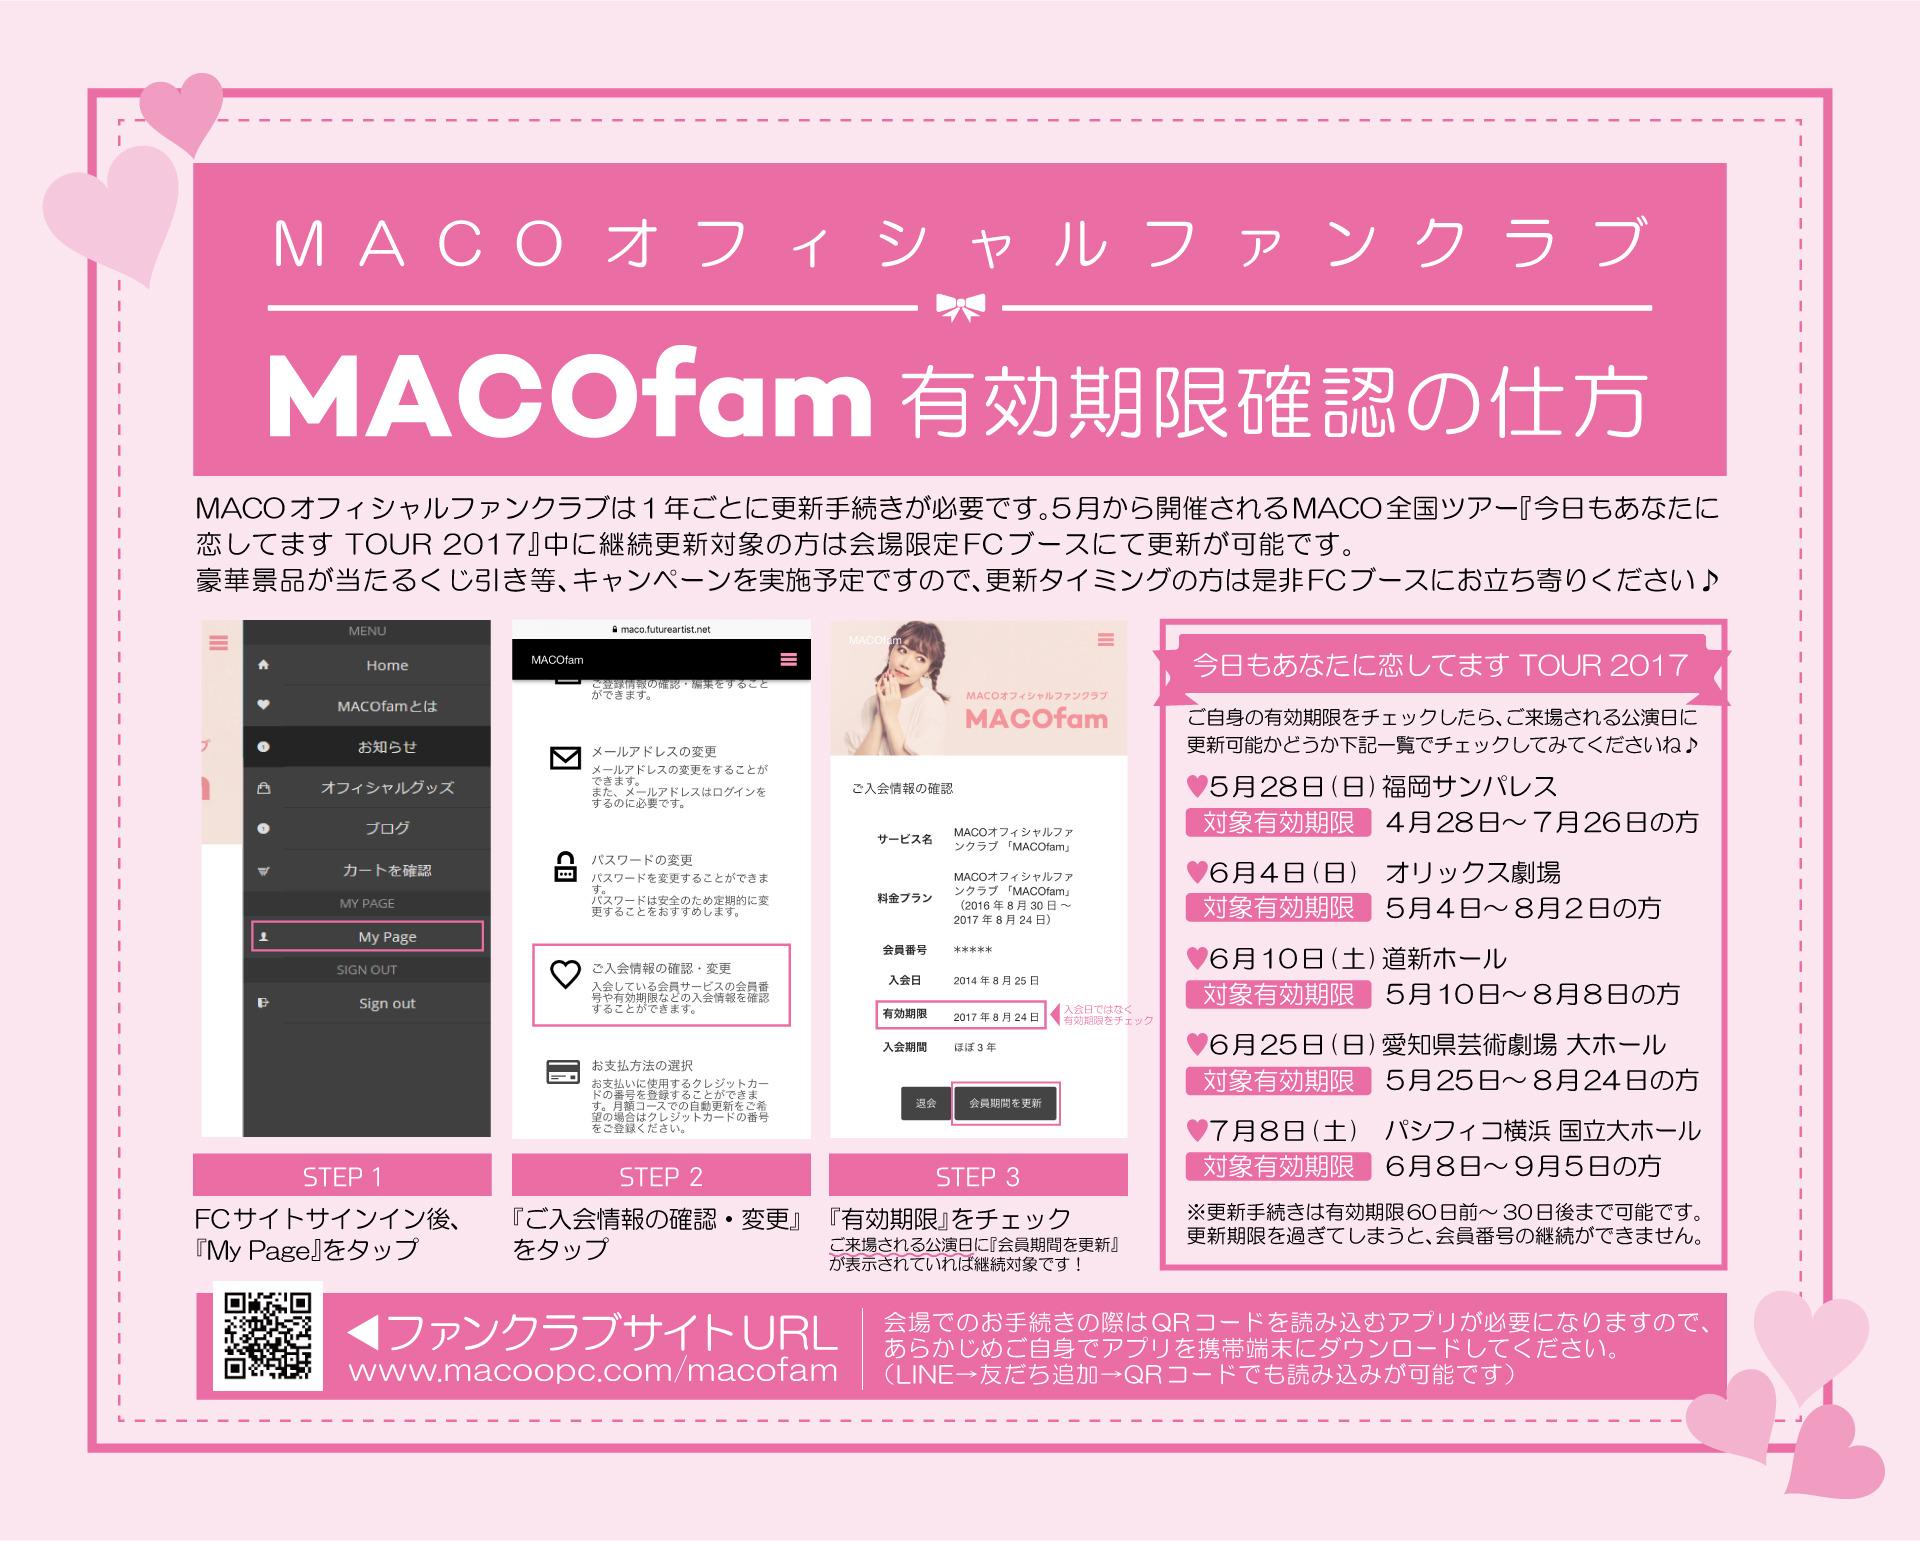 MACOfam有効期限確認の仕方